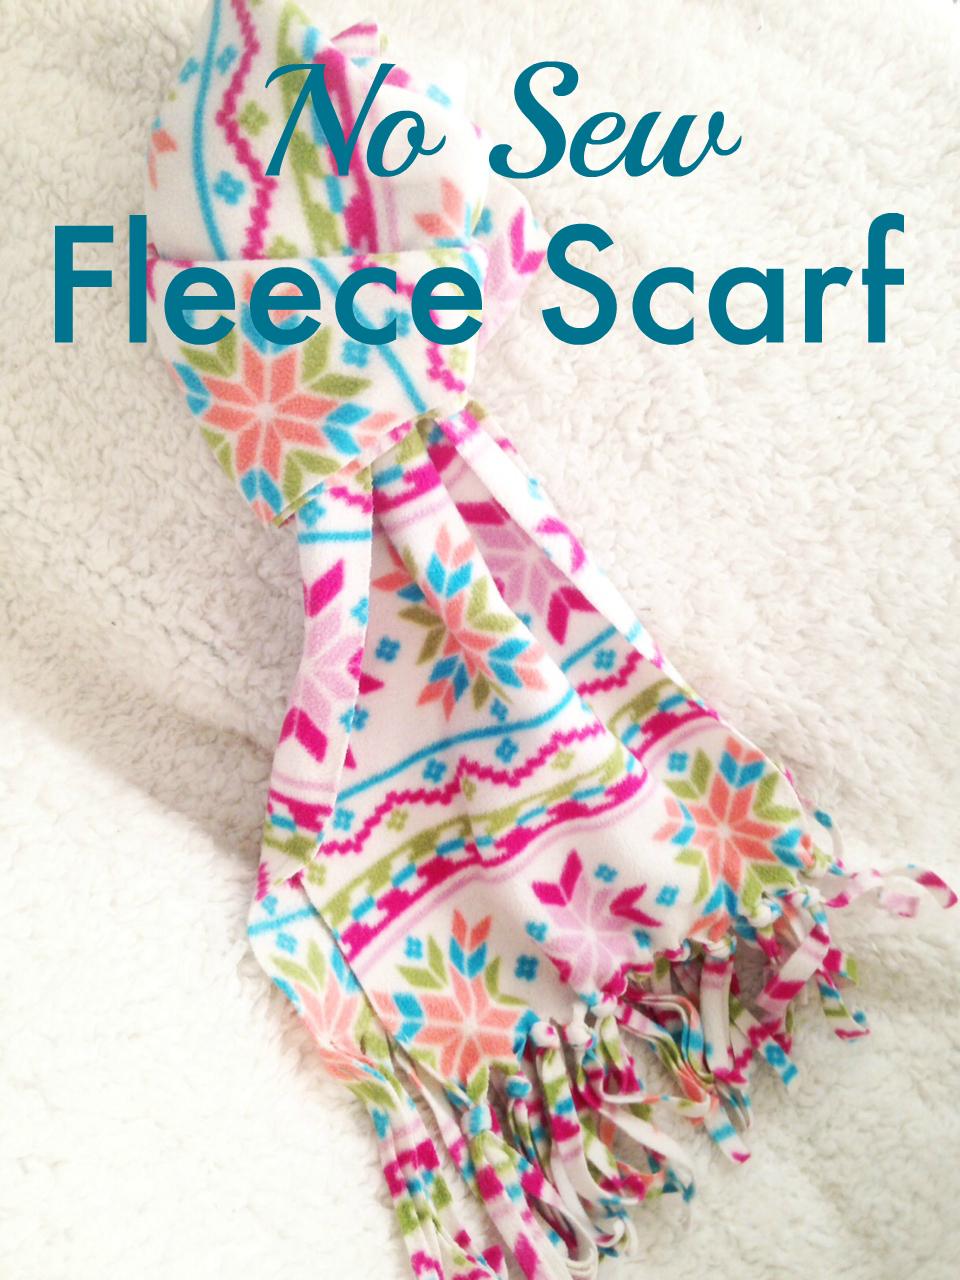 Fleece Scarf Craft